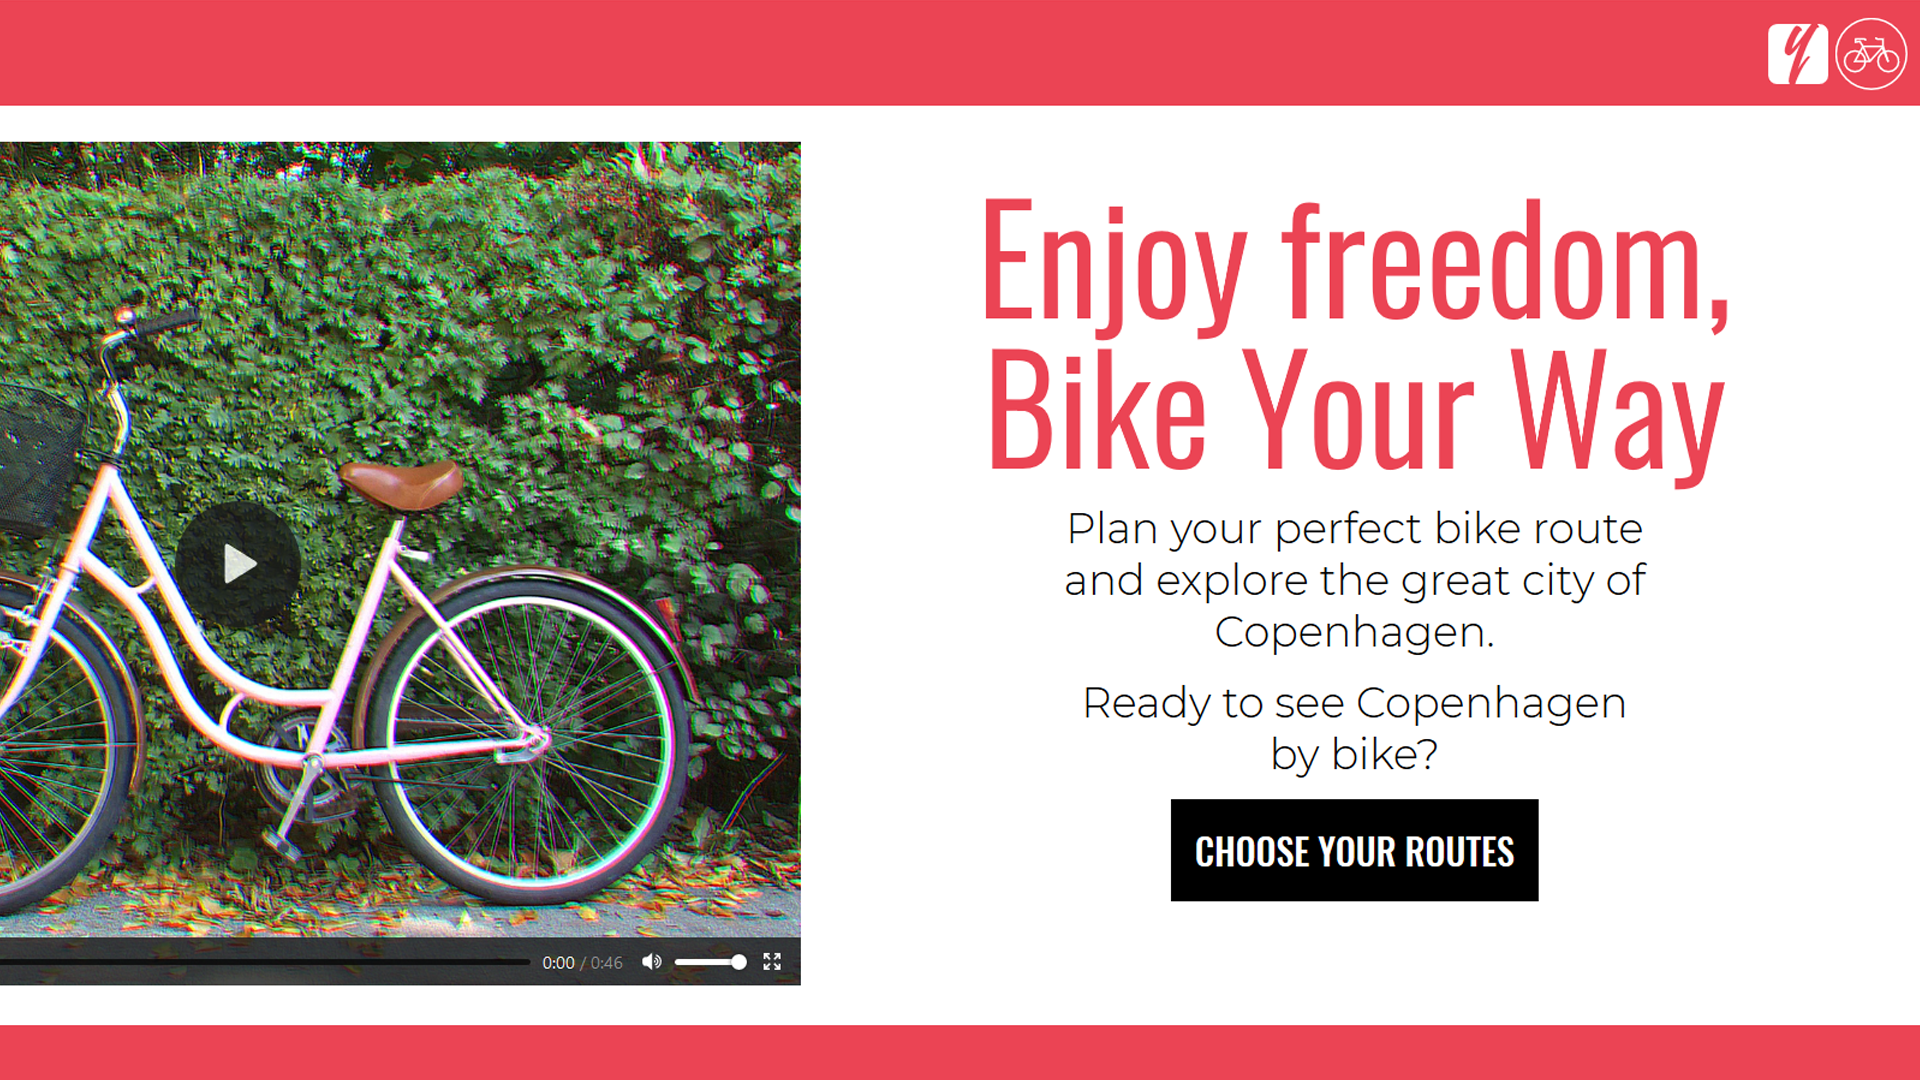 Screen shot of the website Bike Your Way